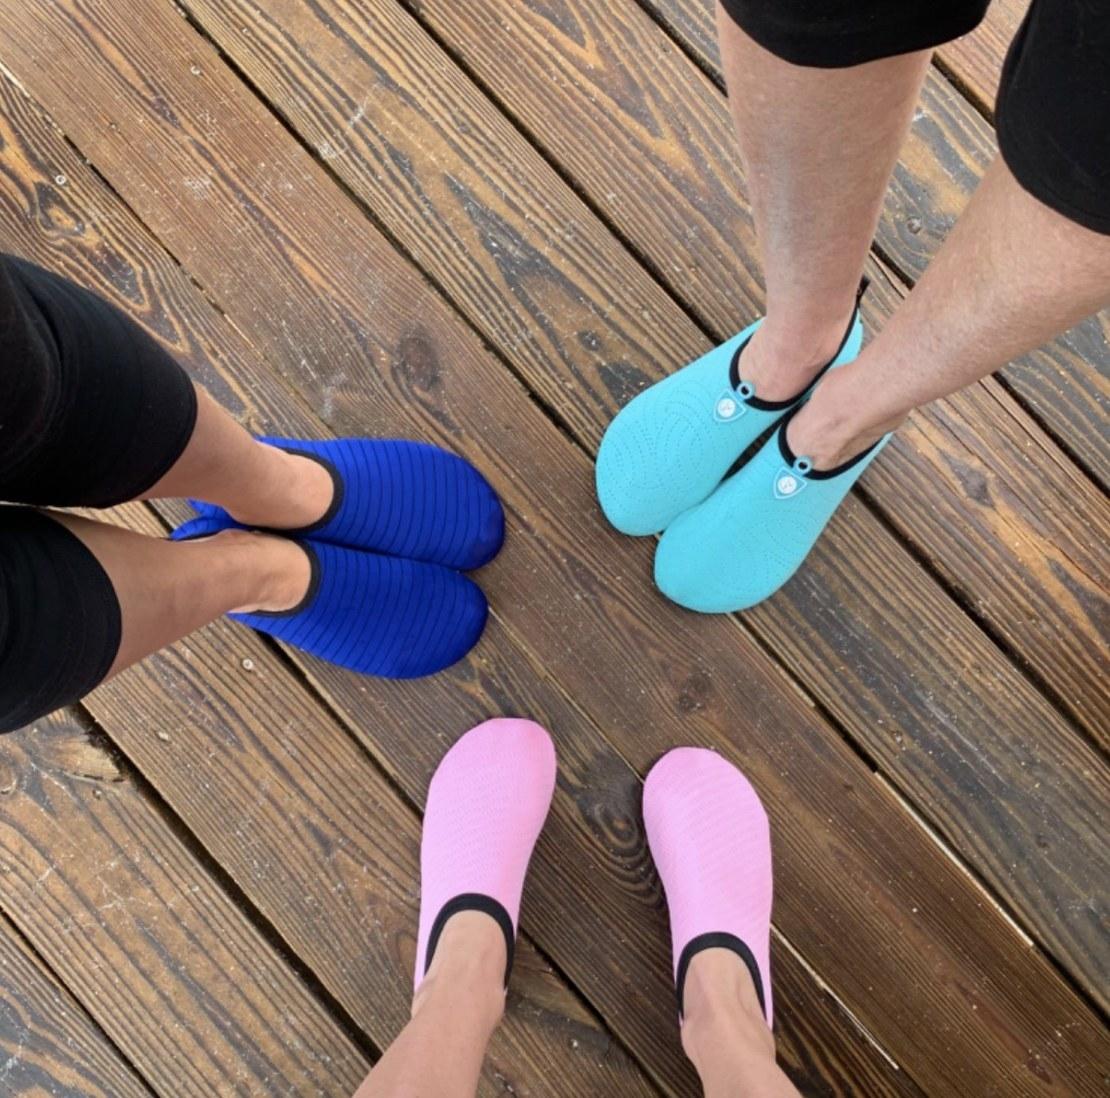 Three people wearing aqua socks